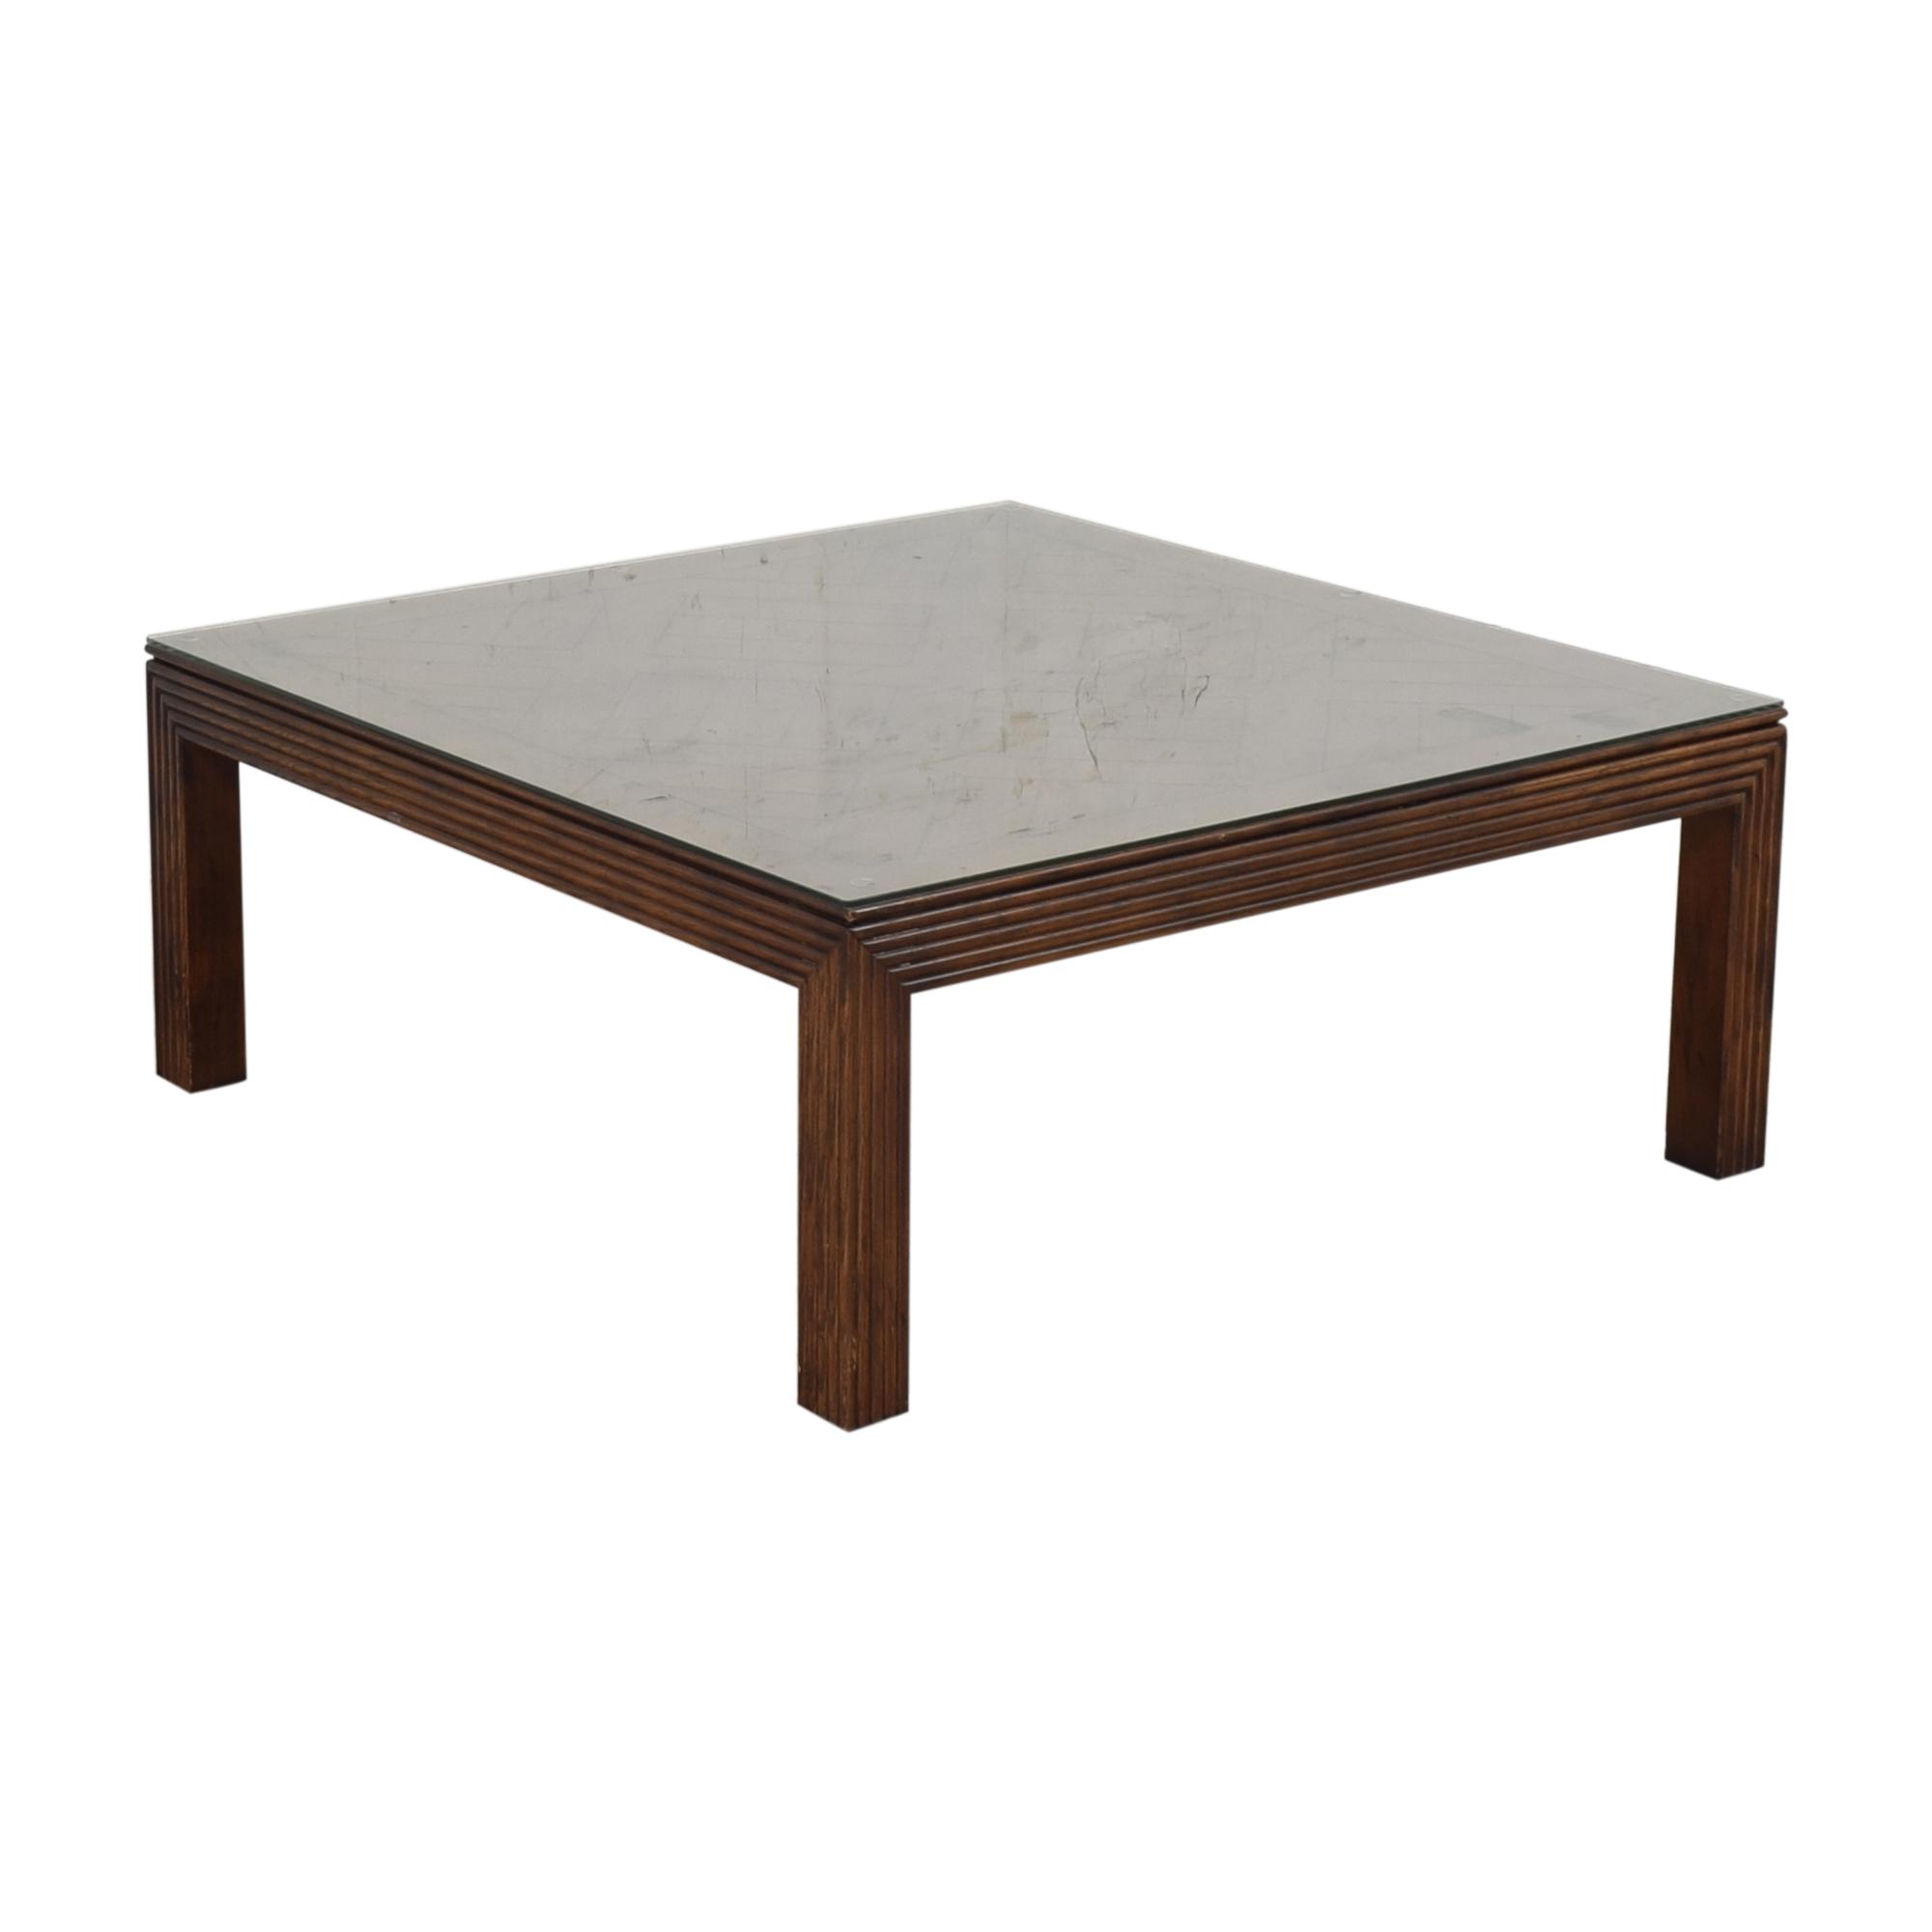 buy Henredon Furniture Square Coffee Table Henredon Furniture Tables